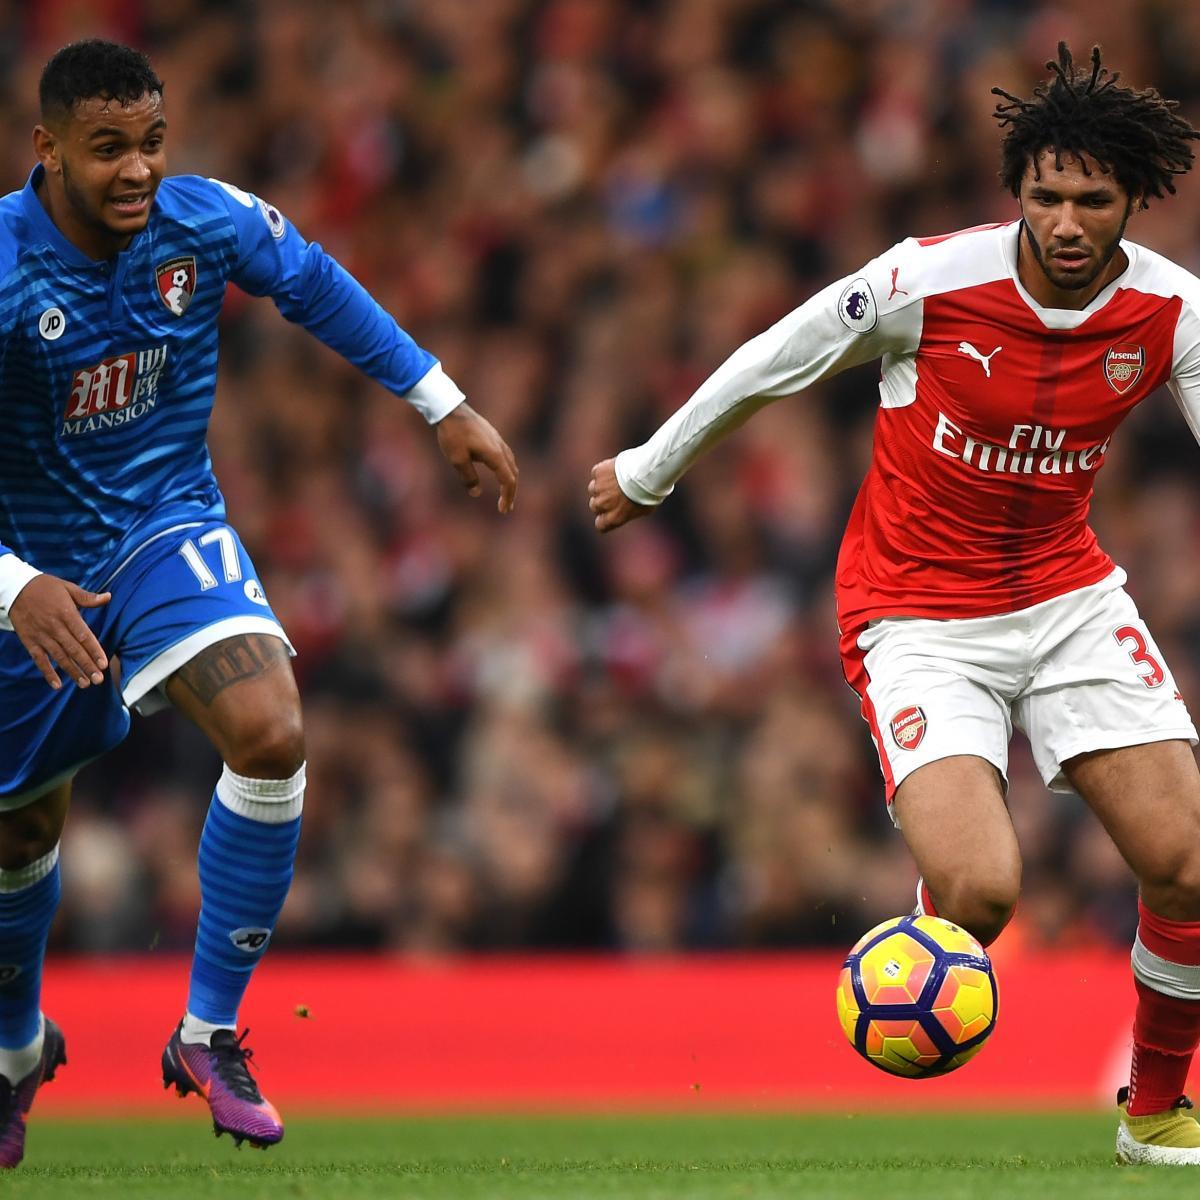 Arsenal Vs Tottenham Live Score Highlights From Premier: Arsenal Vs. Bournemouth: Live Score, Highlights From